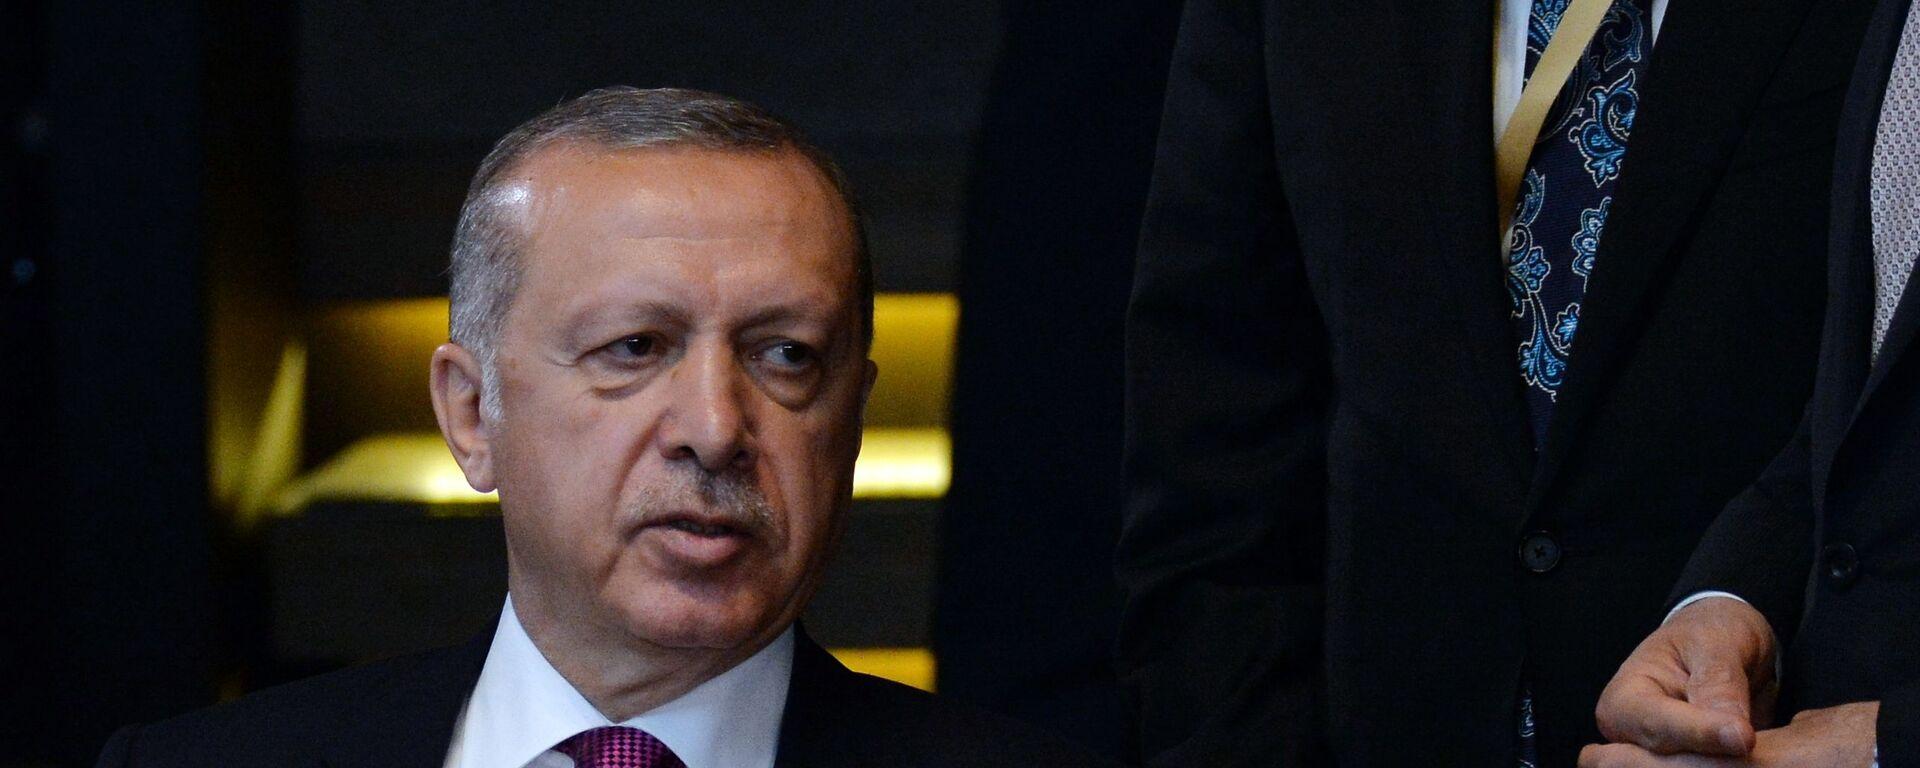 Президент Турции Реджеп Тайип Эрдоган  - Sputnik Армения, 1920, 08.09.2021